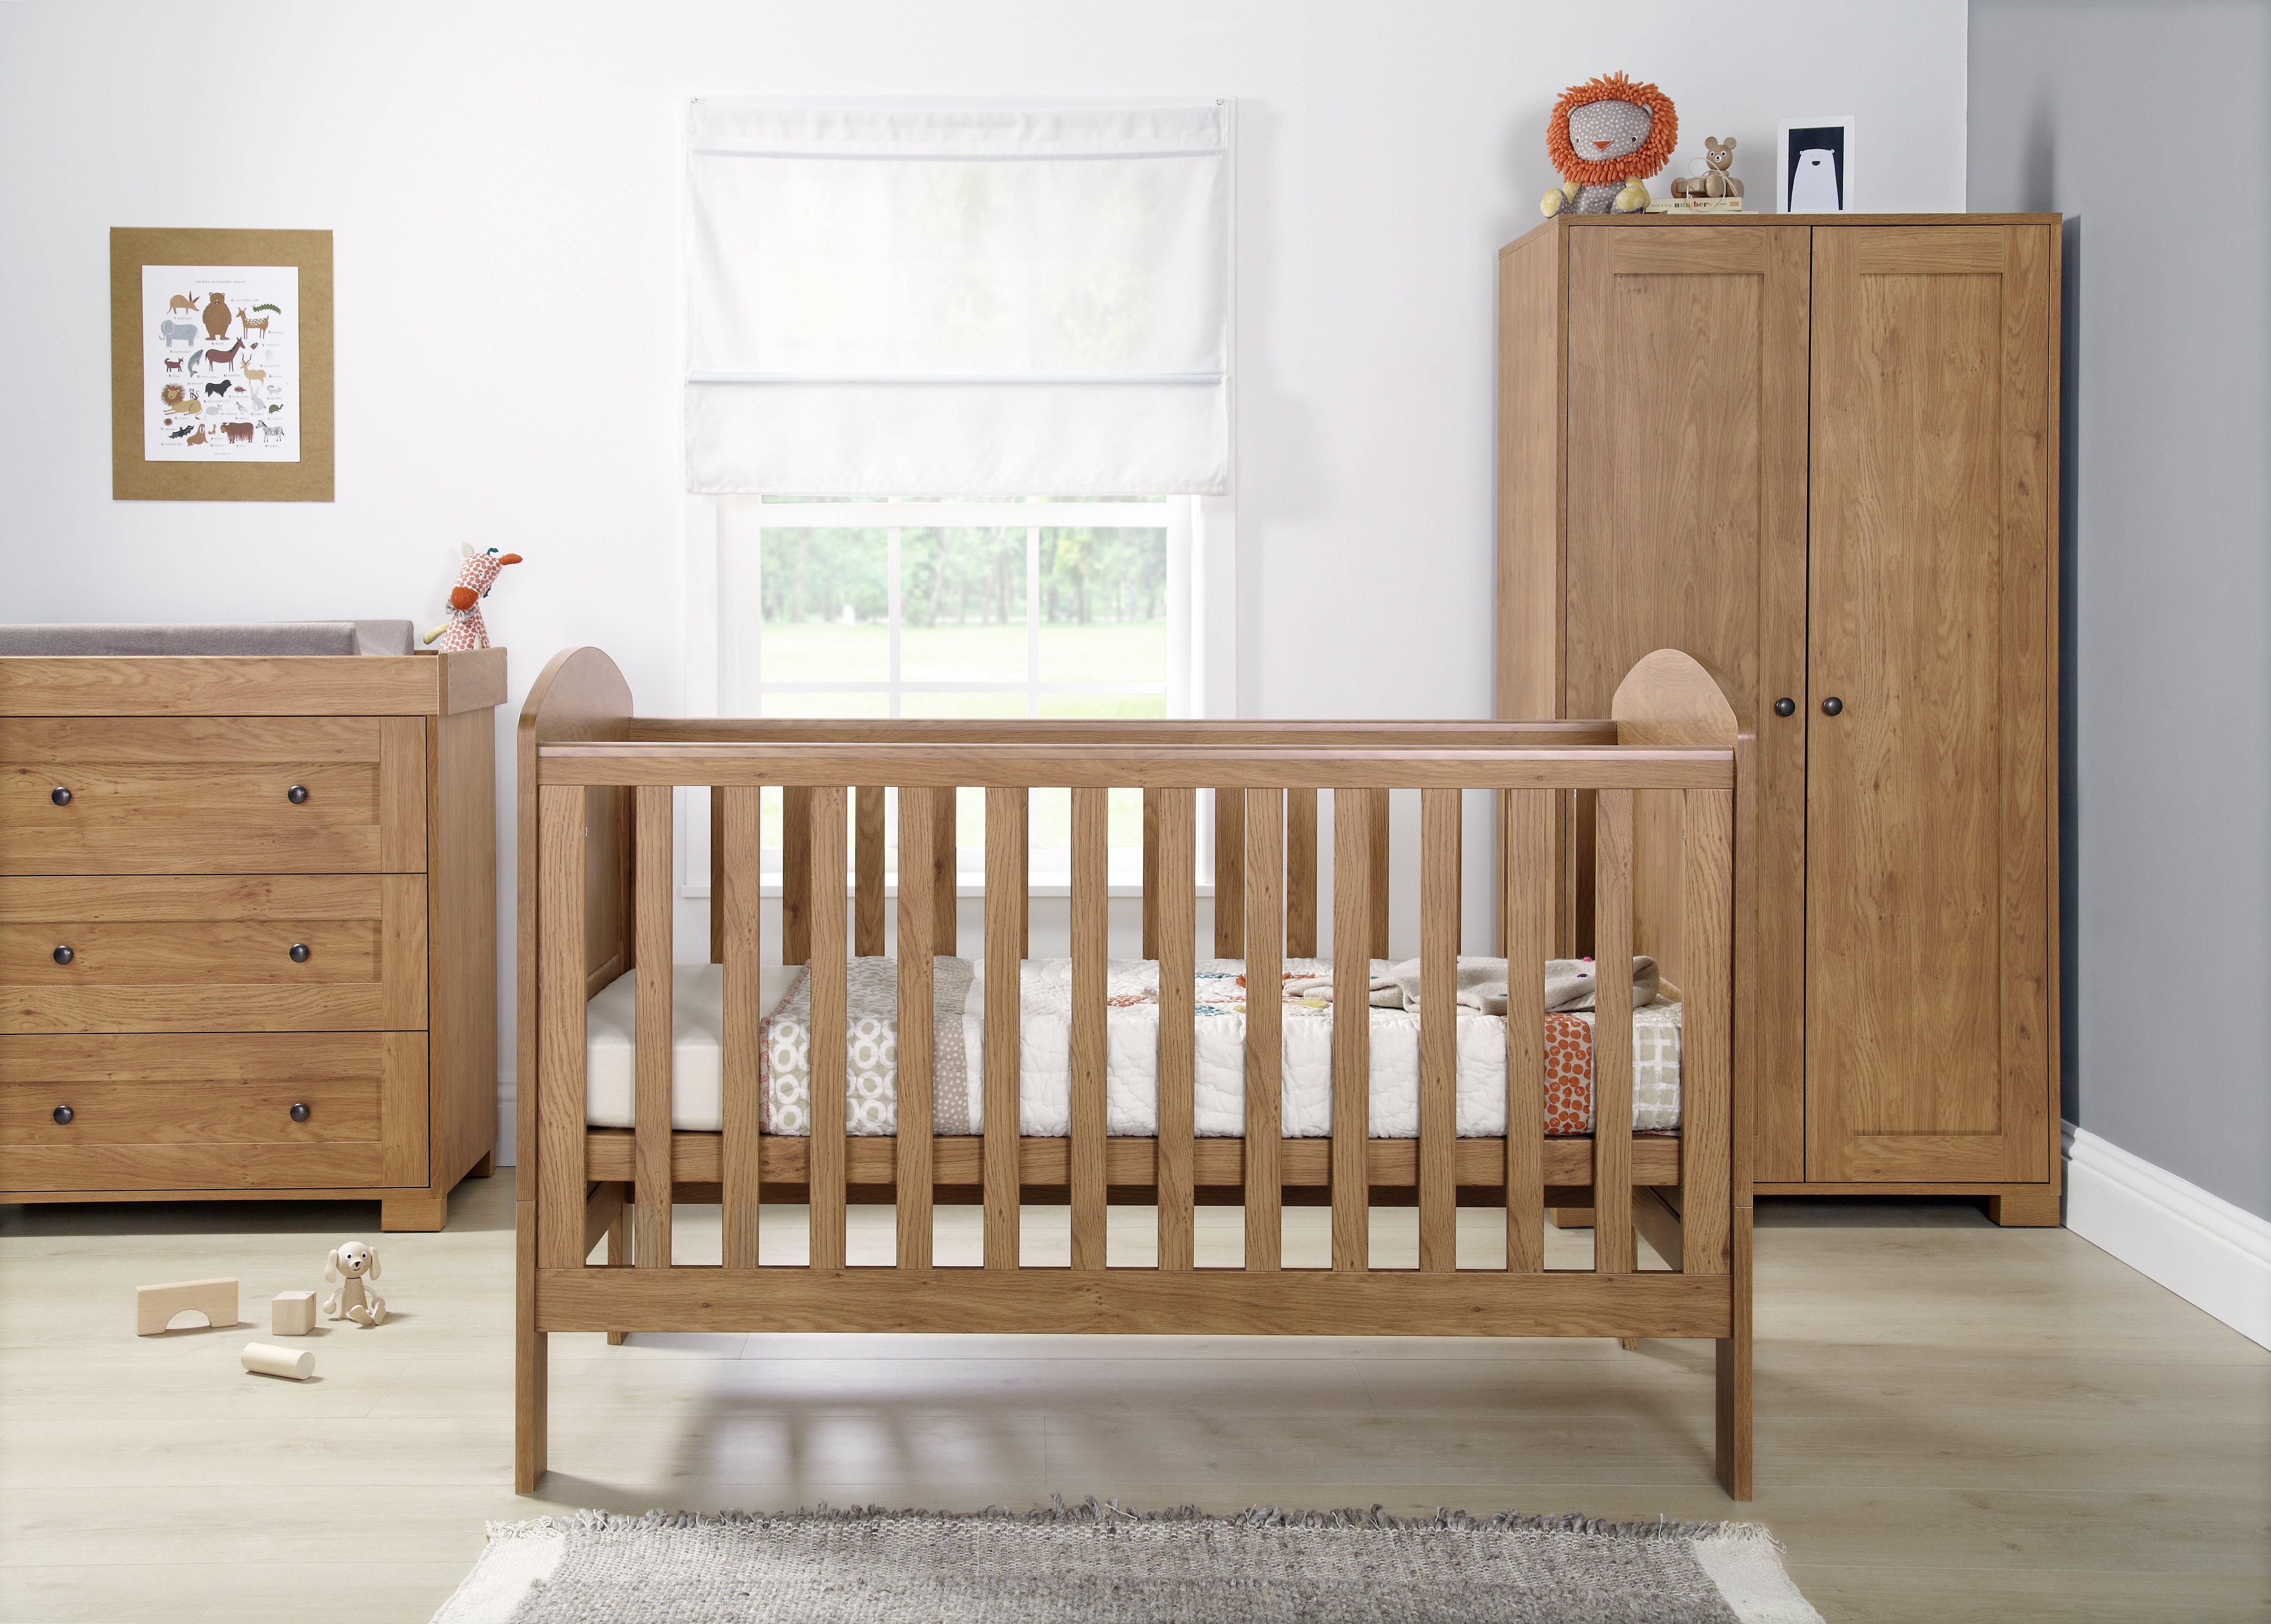 Mamas And Papas Bedroom Furniture Buy Mamas Papas Vico 3 Piece Furniture Set Vintage Pine At